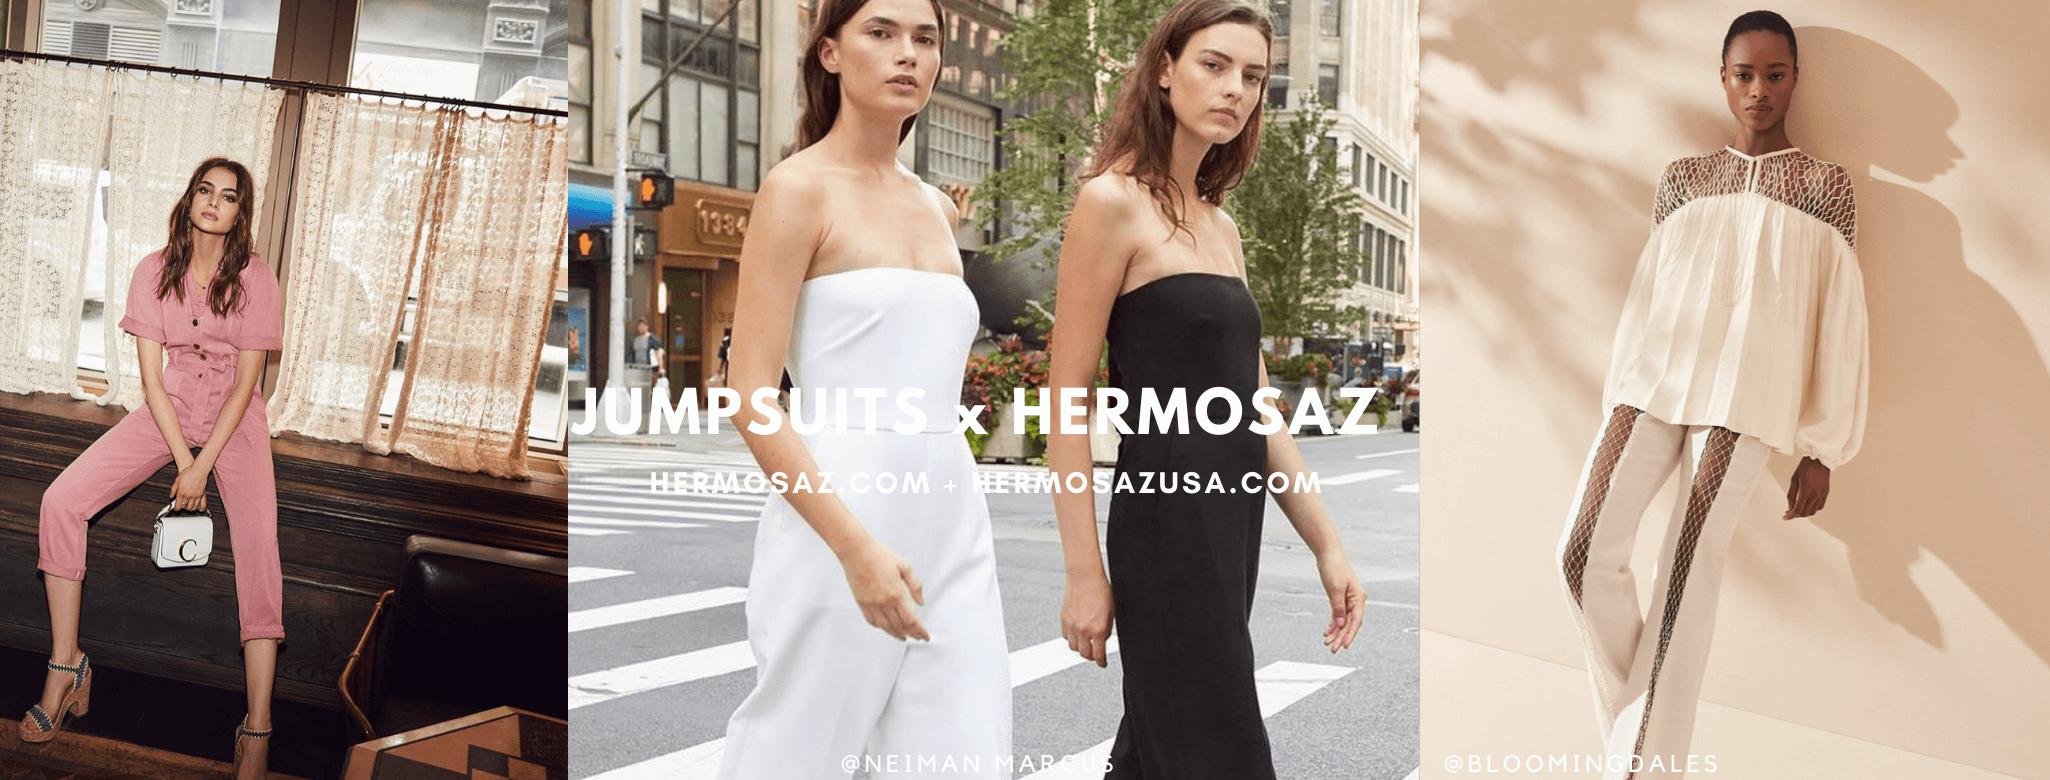 Jumpsuits x Hermosaz